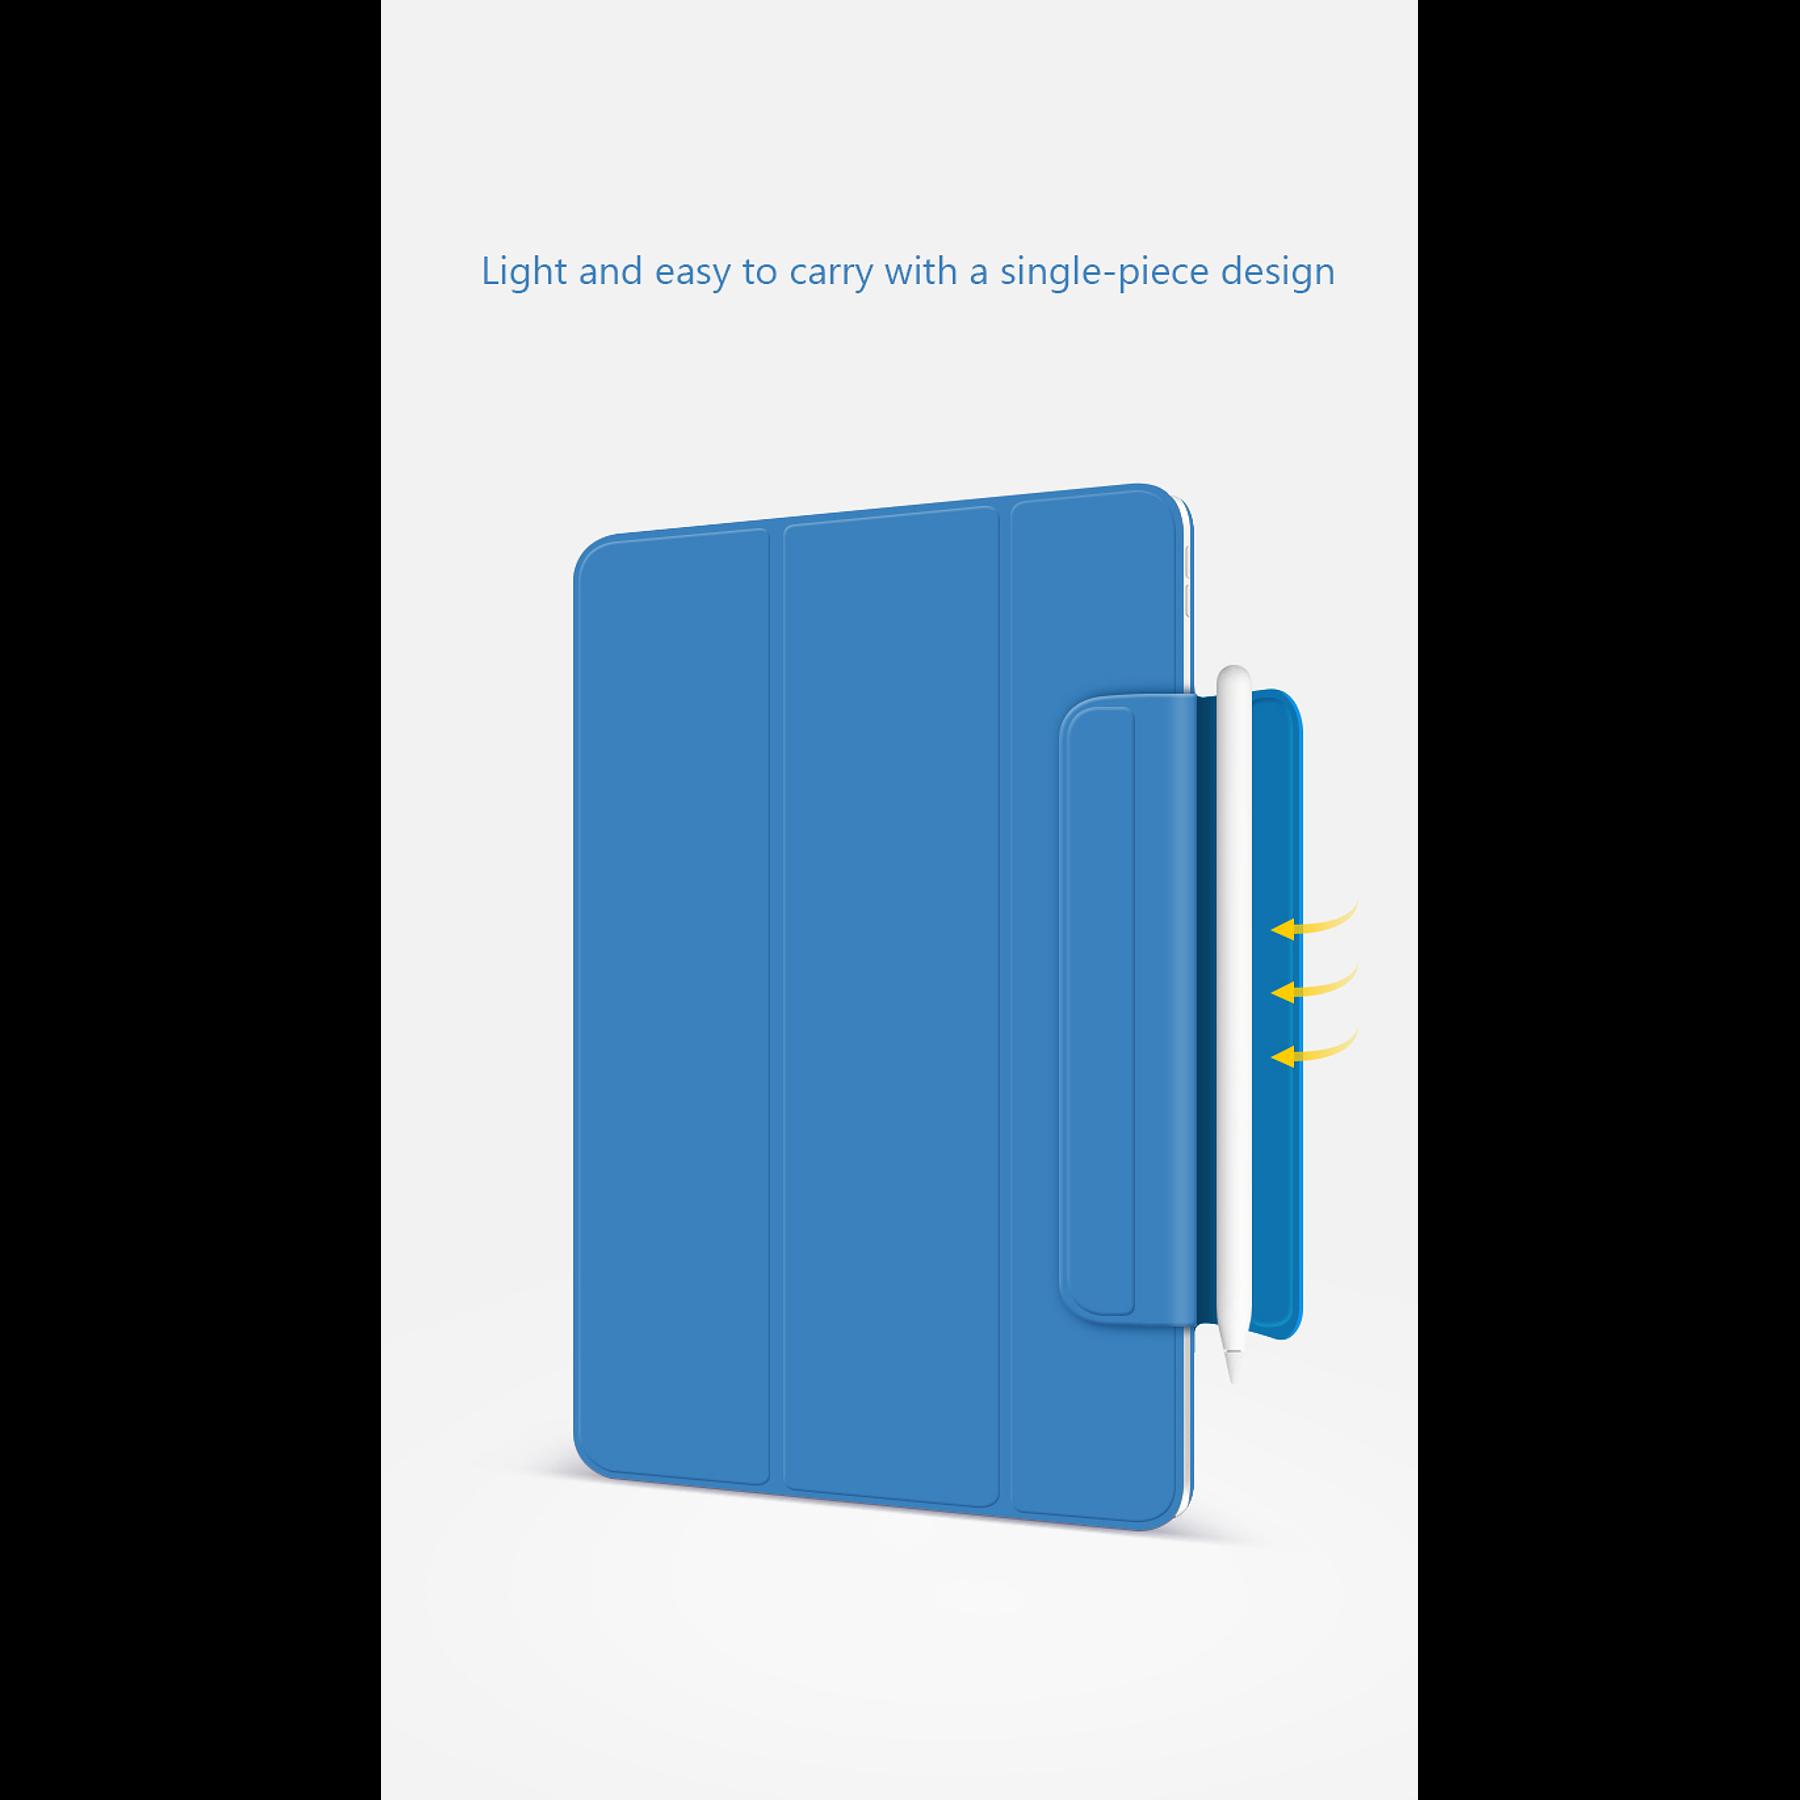 iPad Pro 12.9